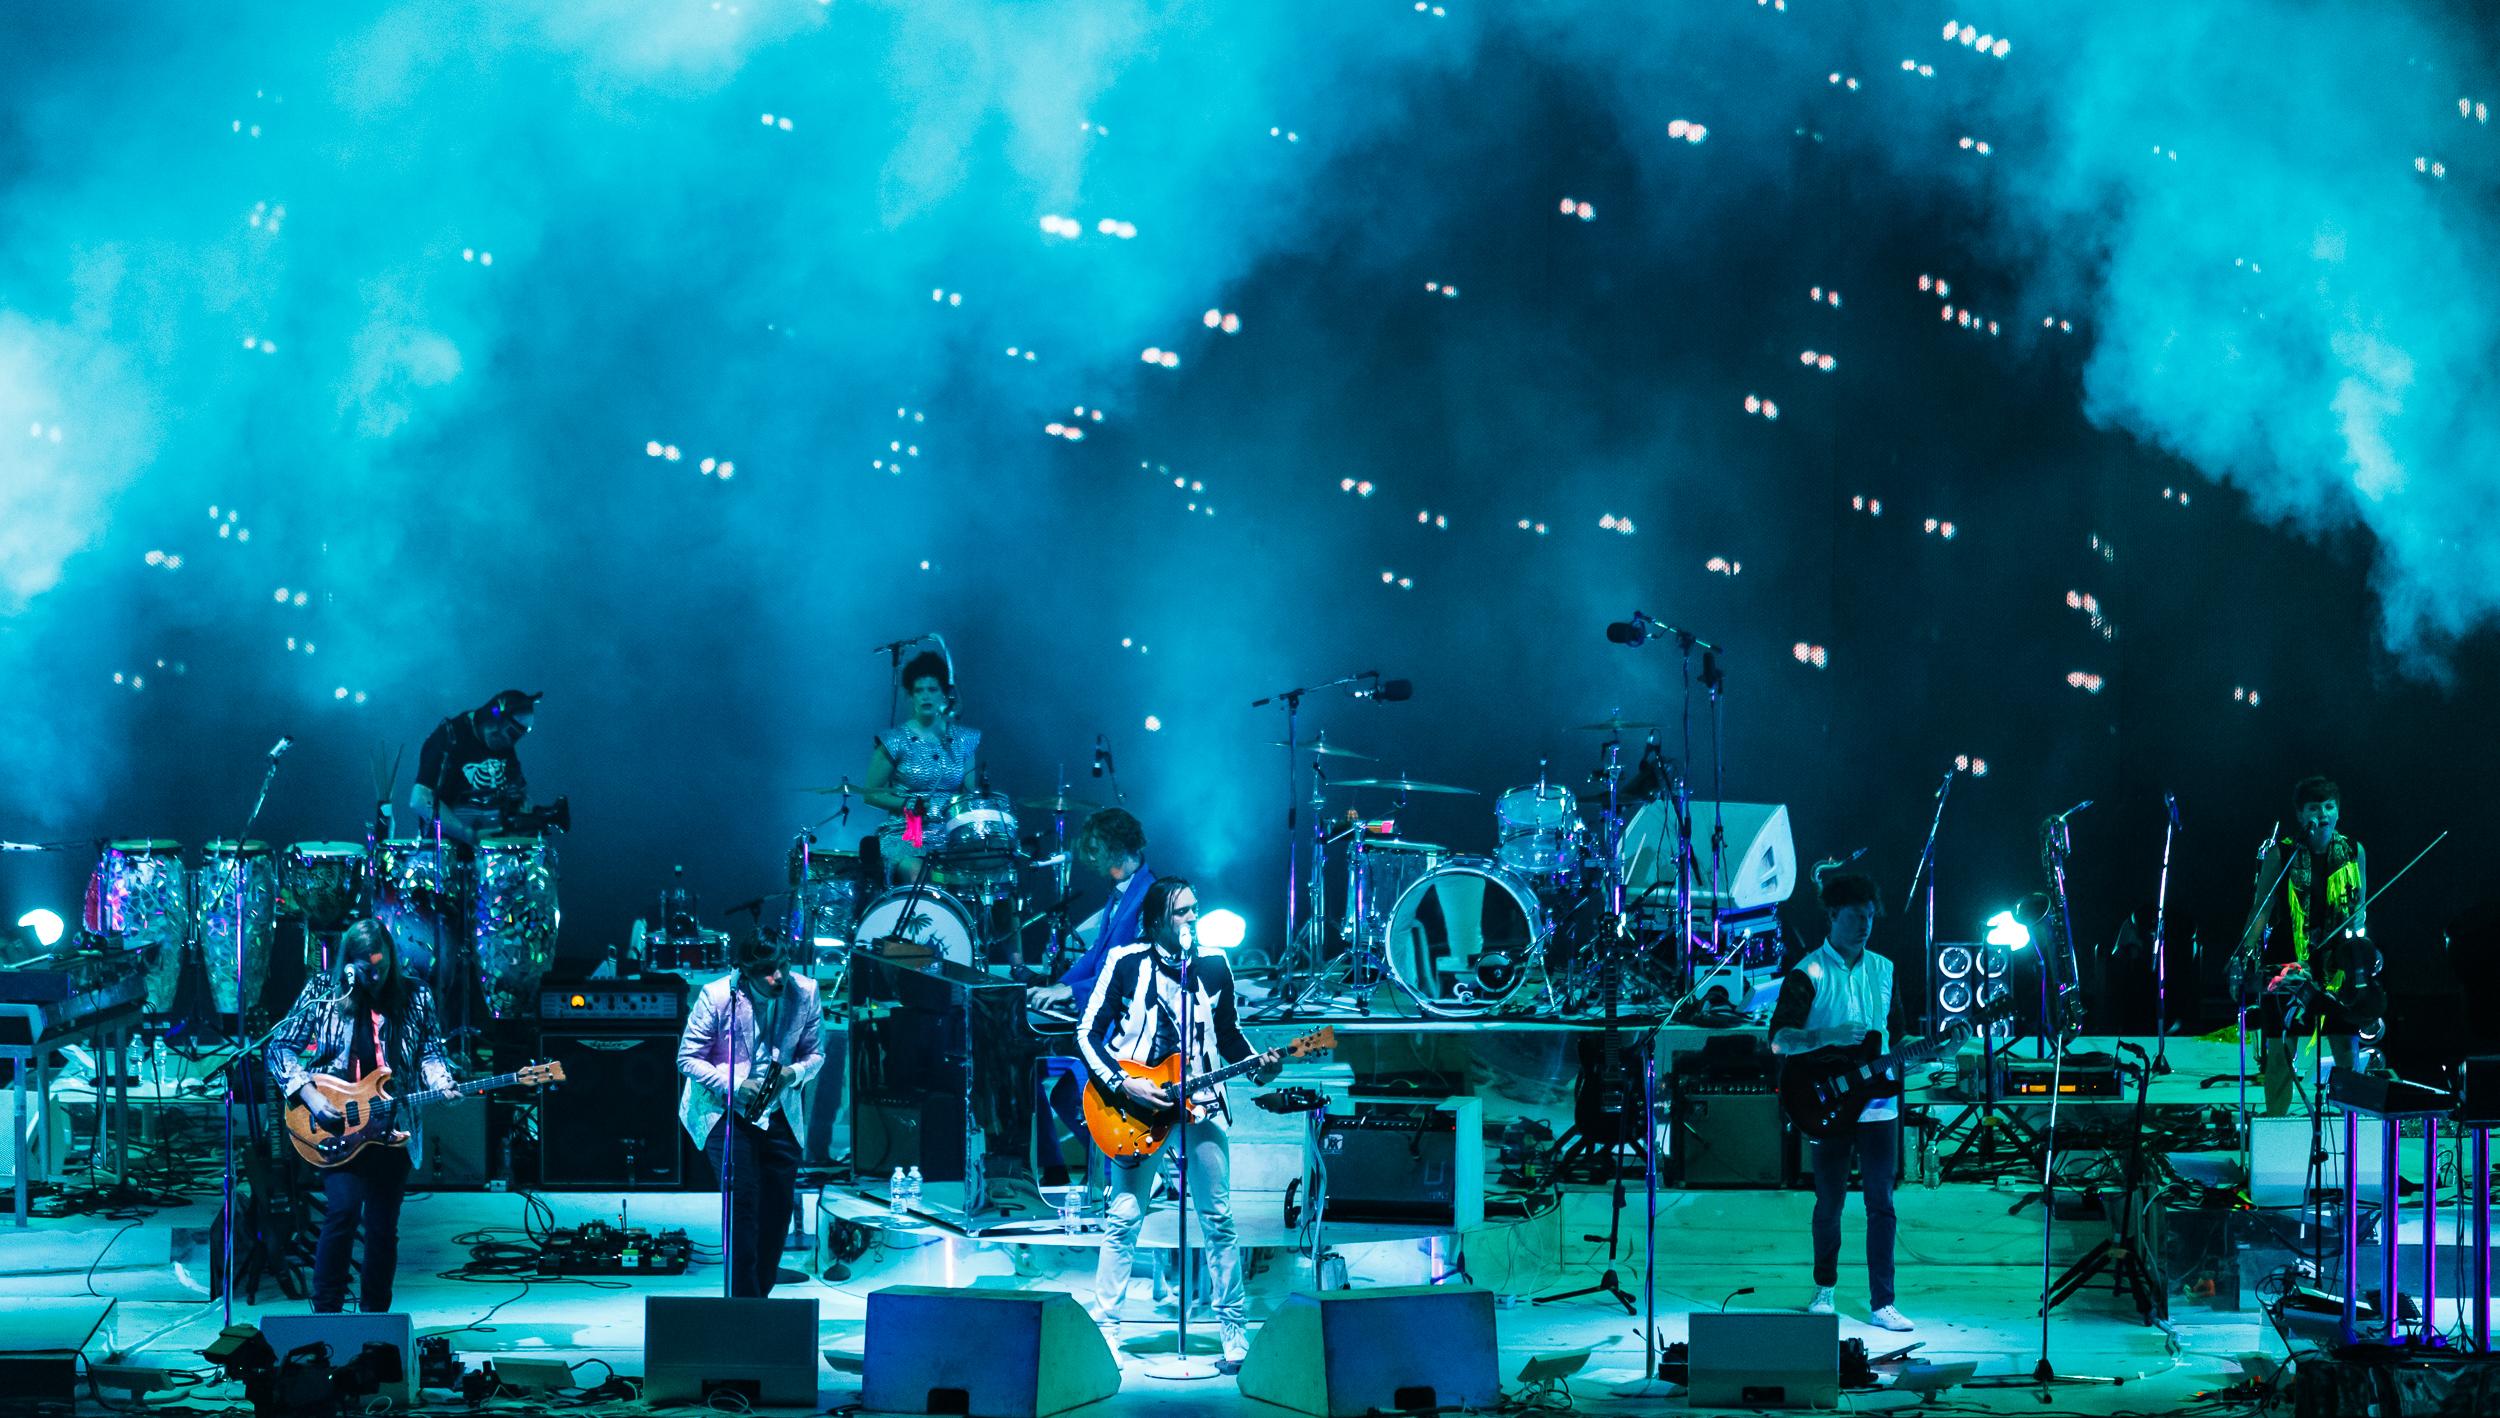 Arcade-Fire-Photo19.jpg